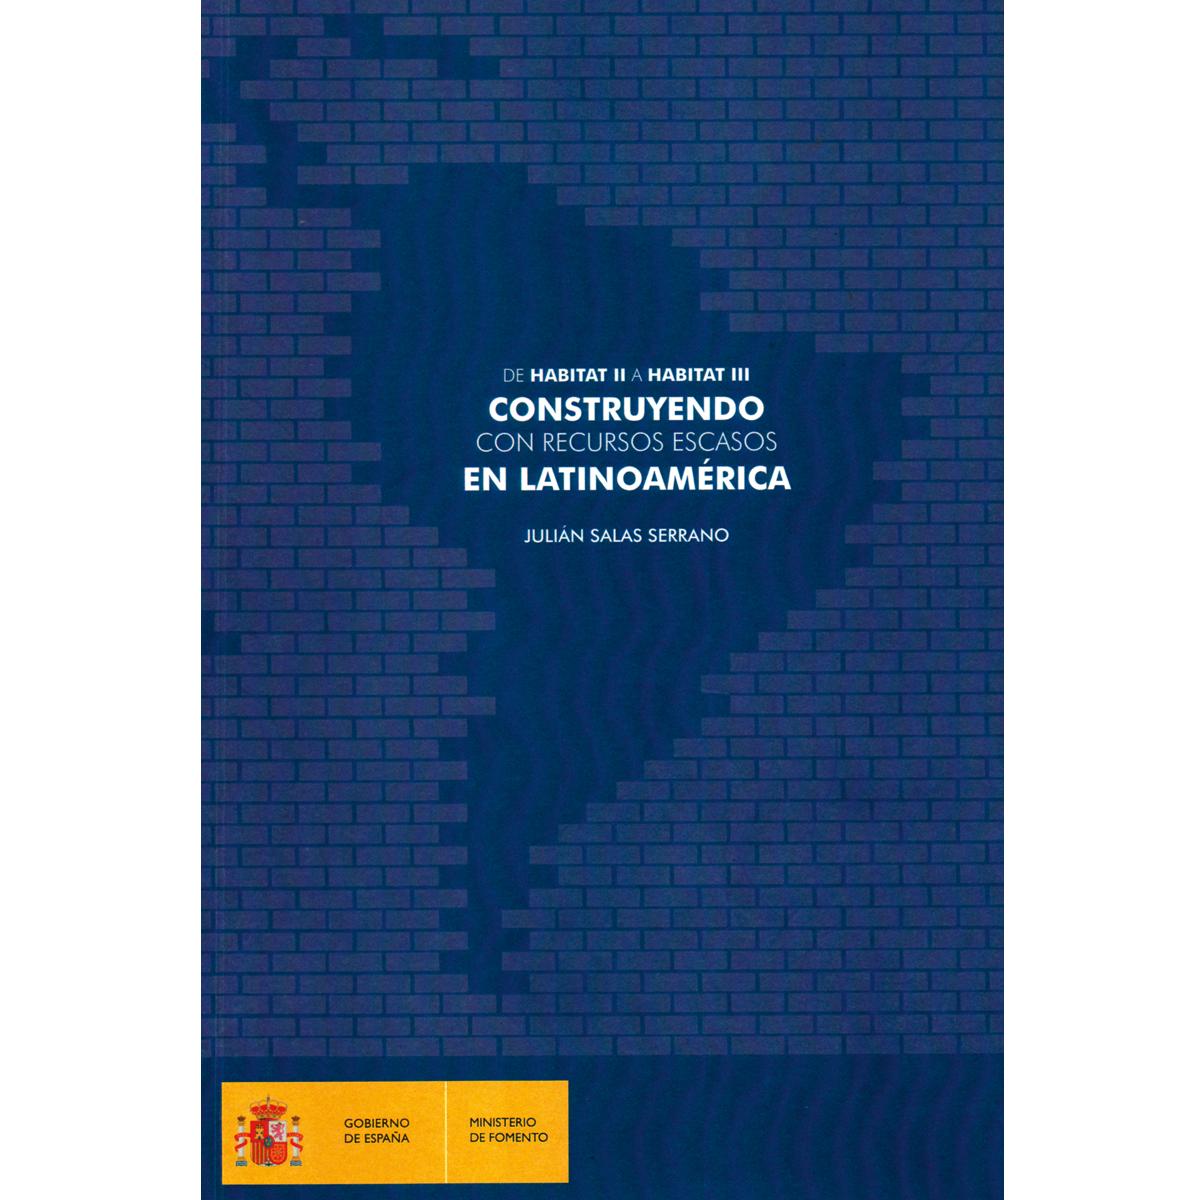 Construyendo con recursos escasos en Latinoamérica